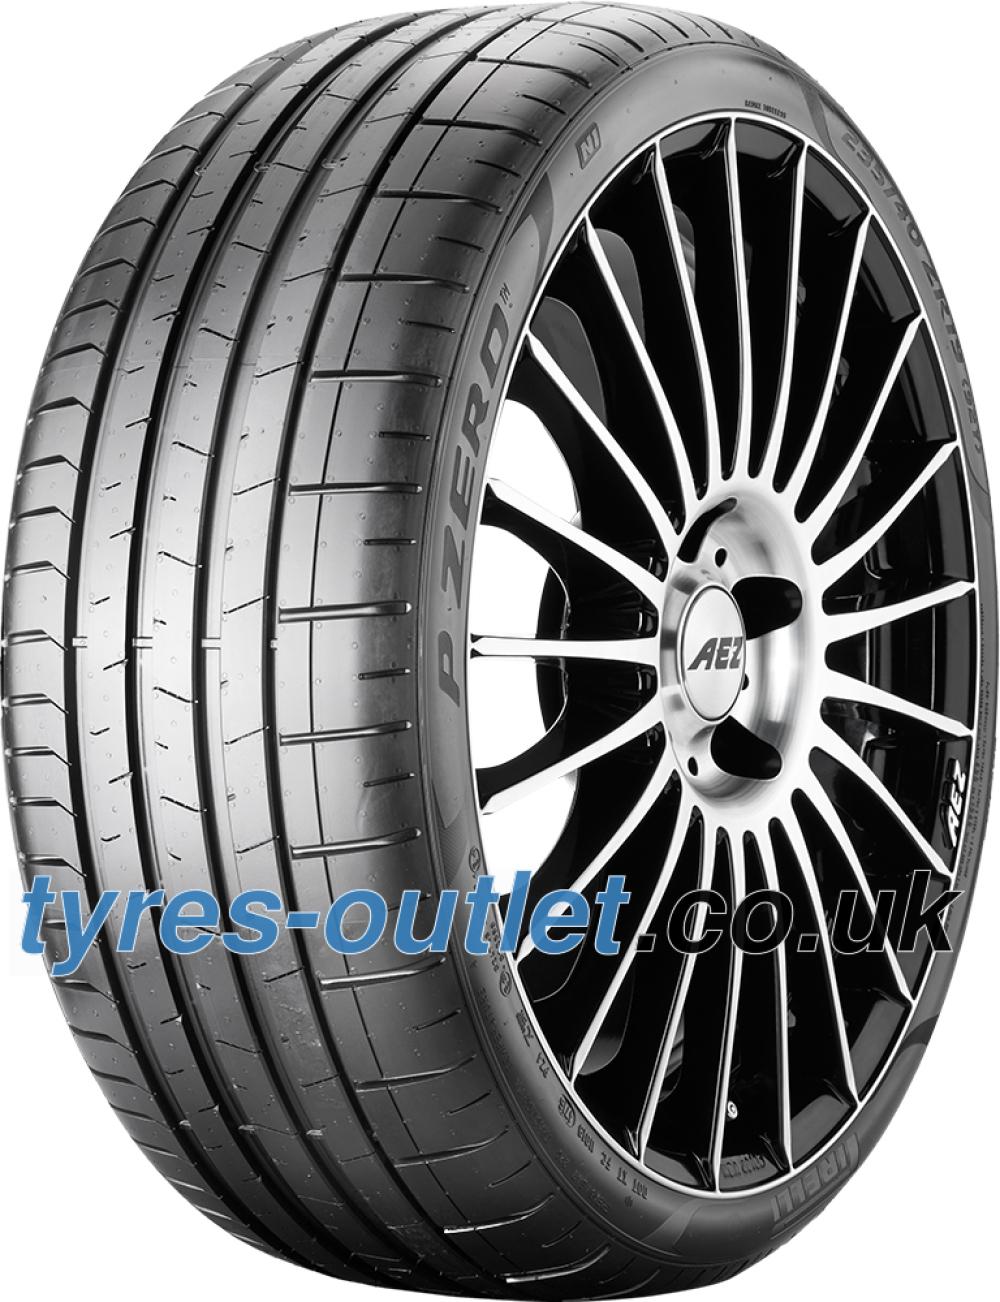 Pirelli P Zero SC ( 235/40 ZR18 95Y XL BST )